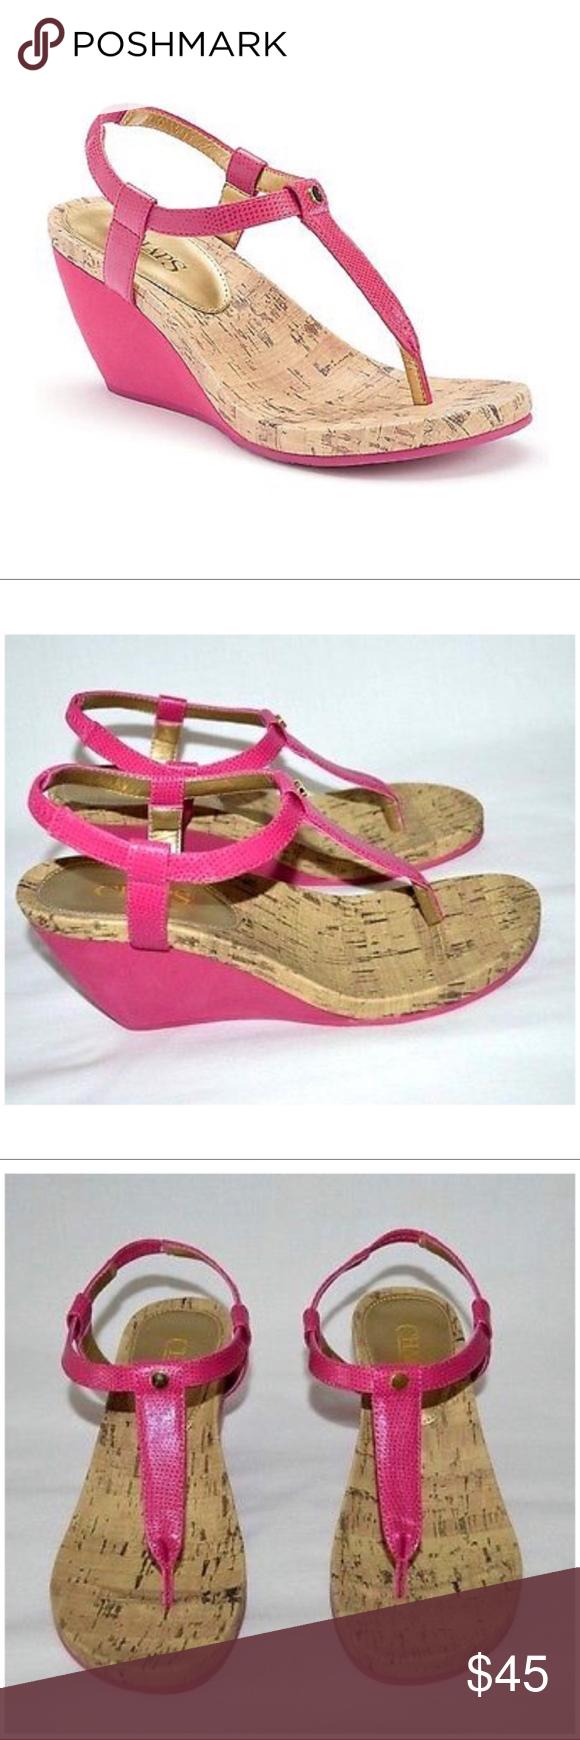 39718eccef4 Chaps Pink Thong Wedge Sandals NWT